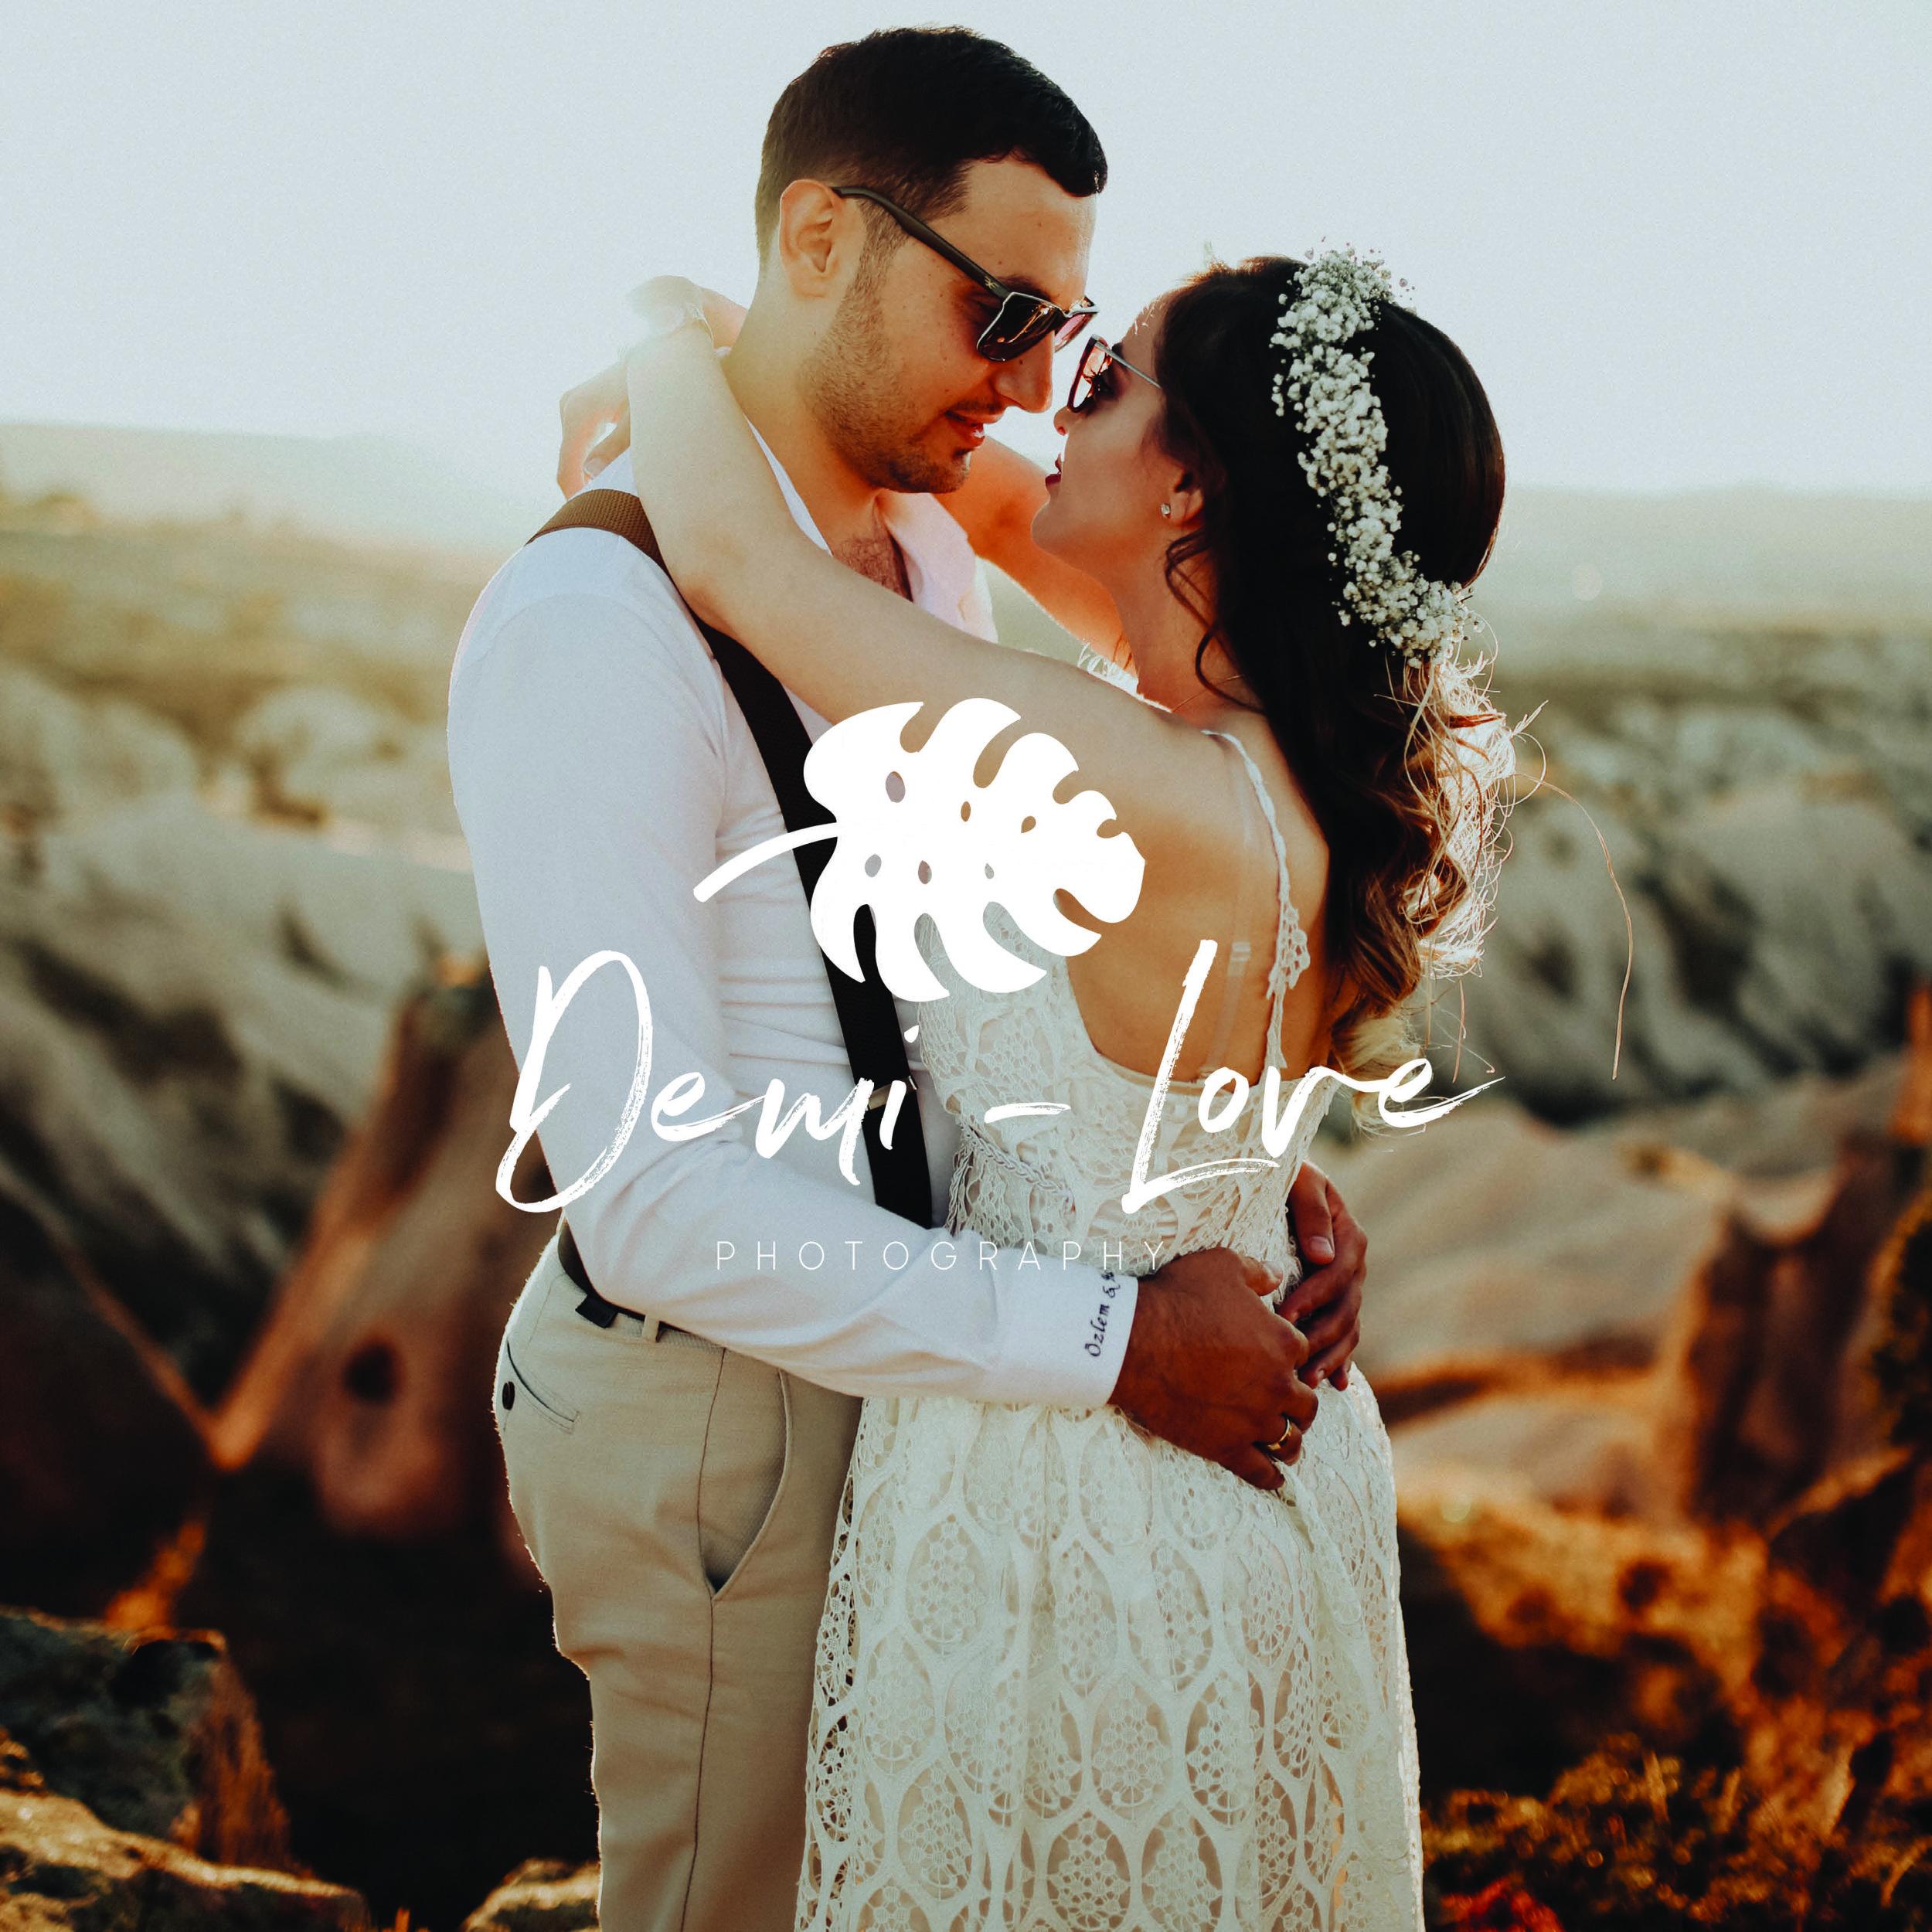 Demi-LovePhotography-Brand4.jpg